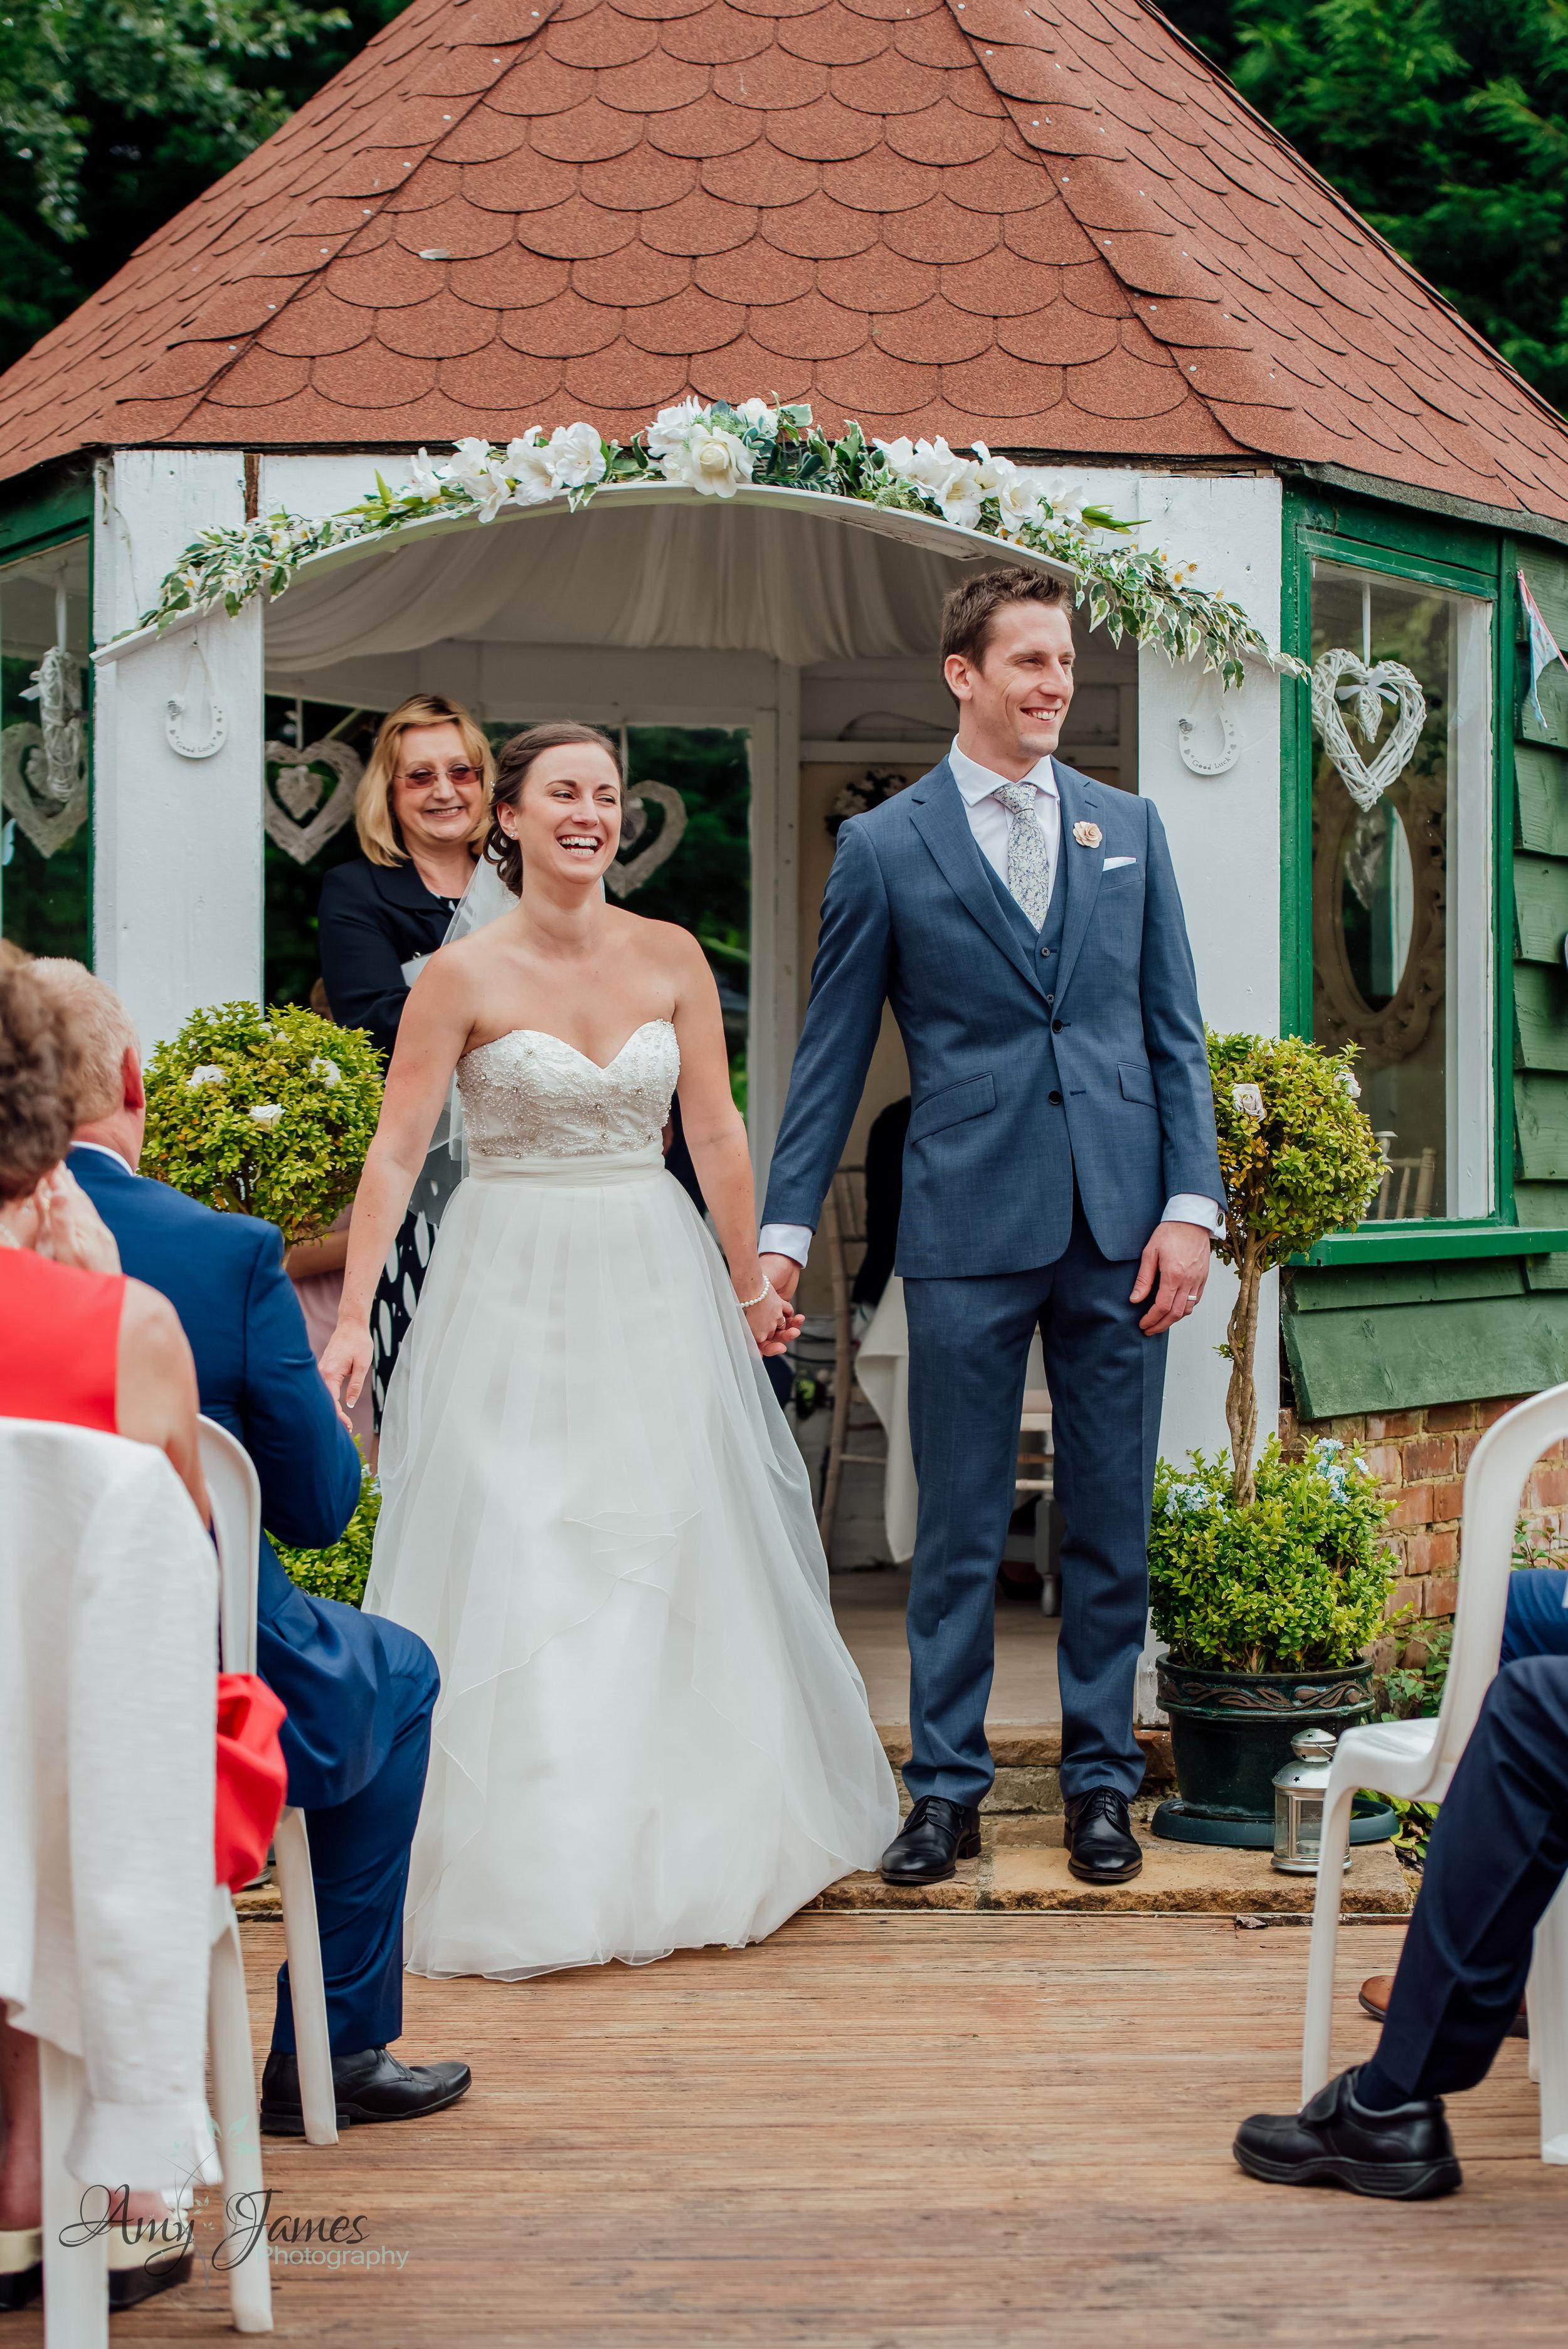 Outdoor garden wedding ceremony photograph by Amy James Photography Hampshire Wedding Photographer - Taplins Place Wedding